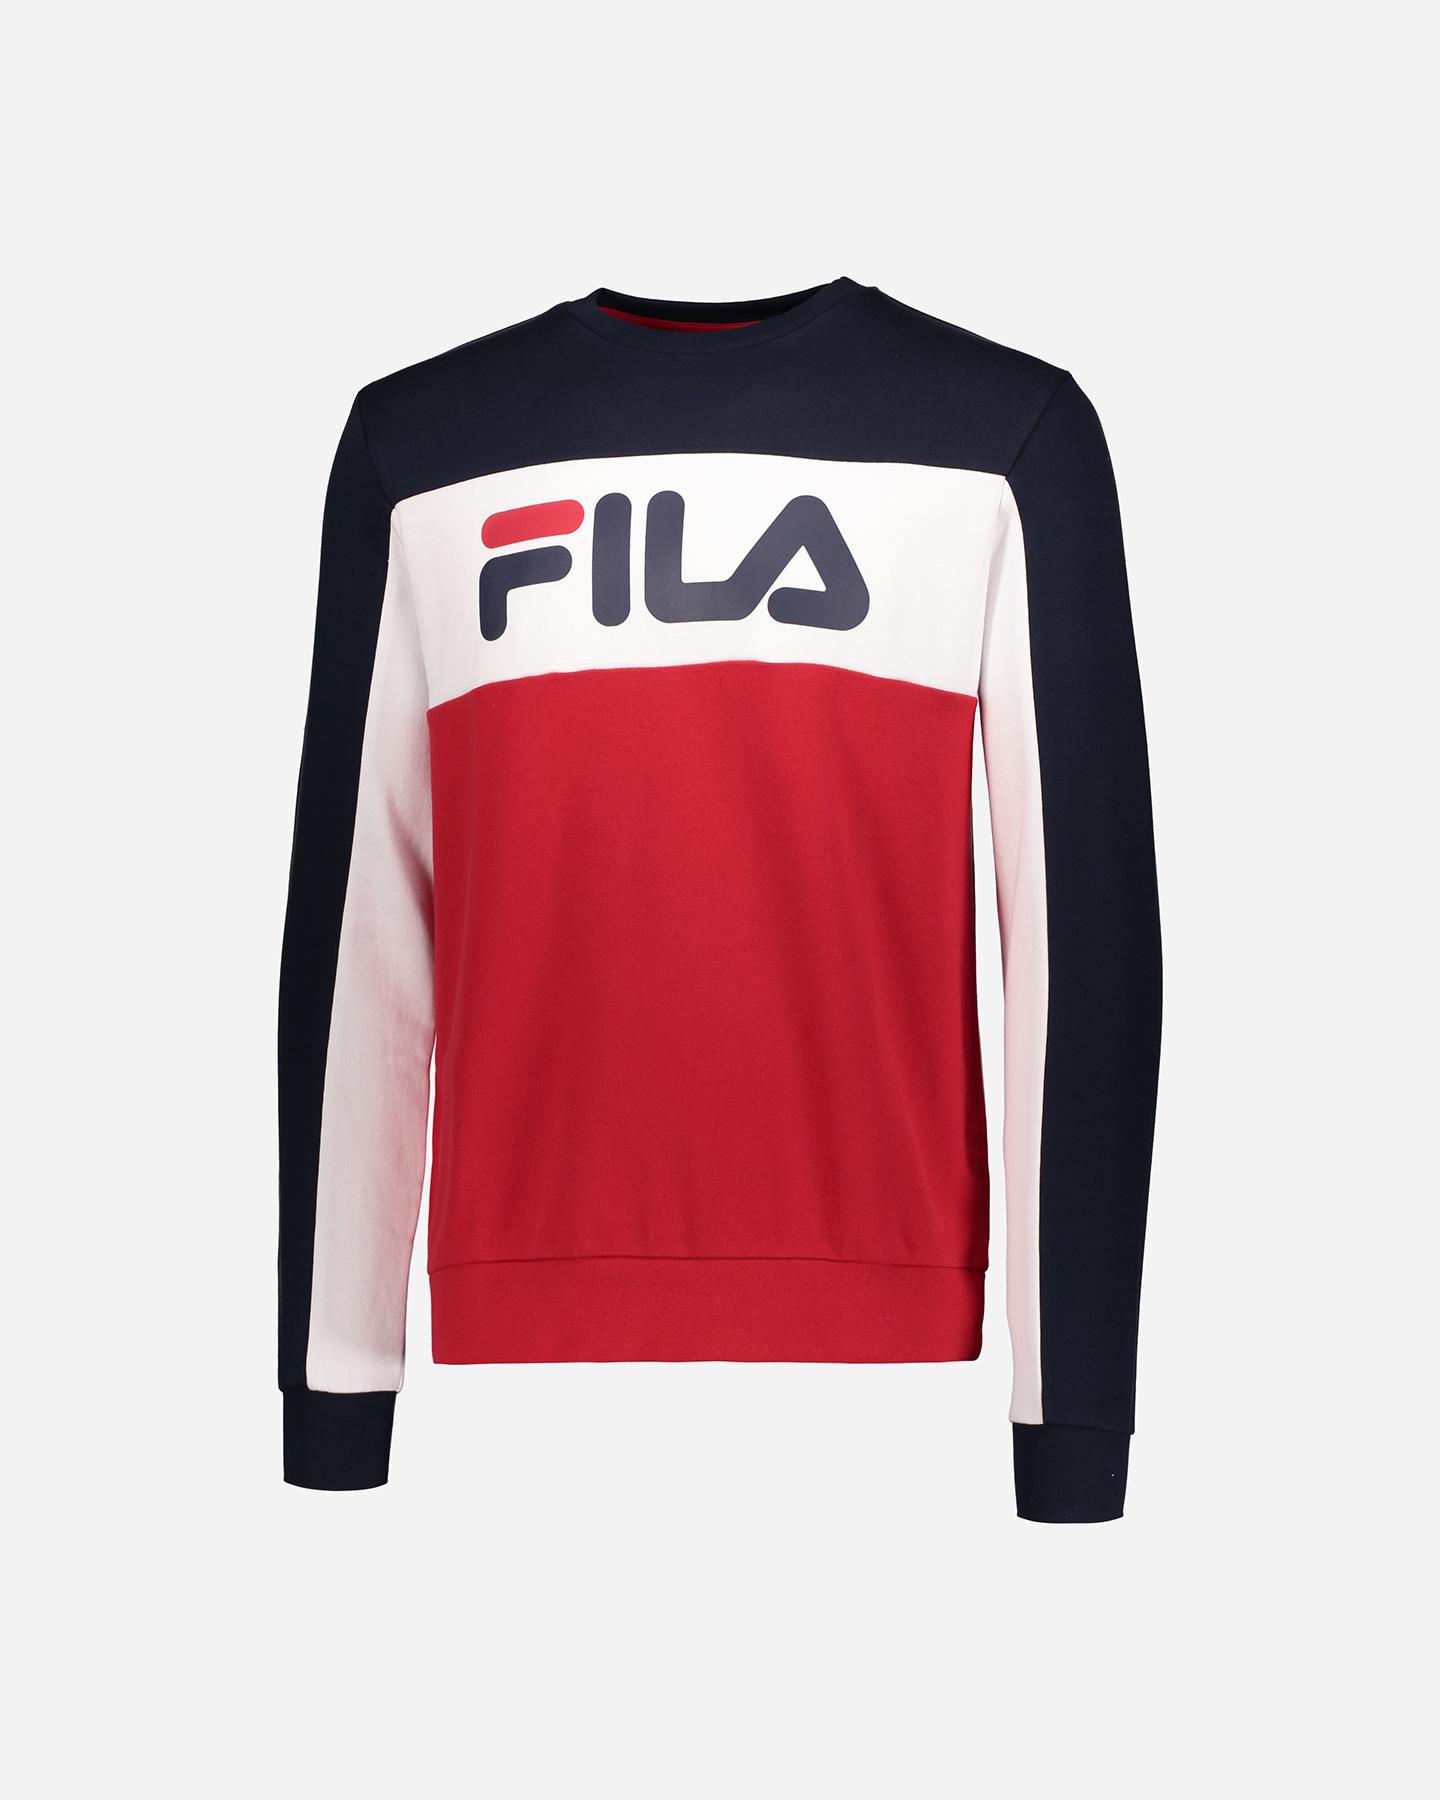 non chiaro Assedio Muschio  Felpa Fila Icon Sweatshirt M FM813W18-935/270 | Cisalfa Sport